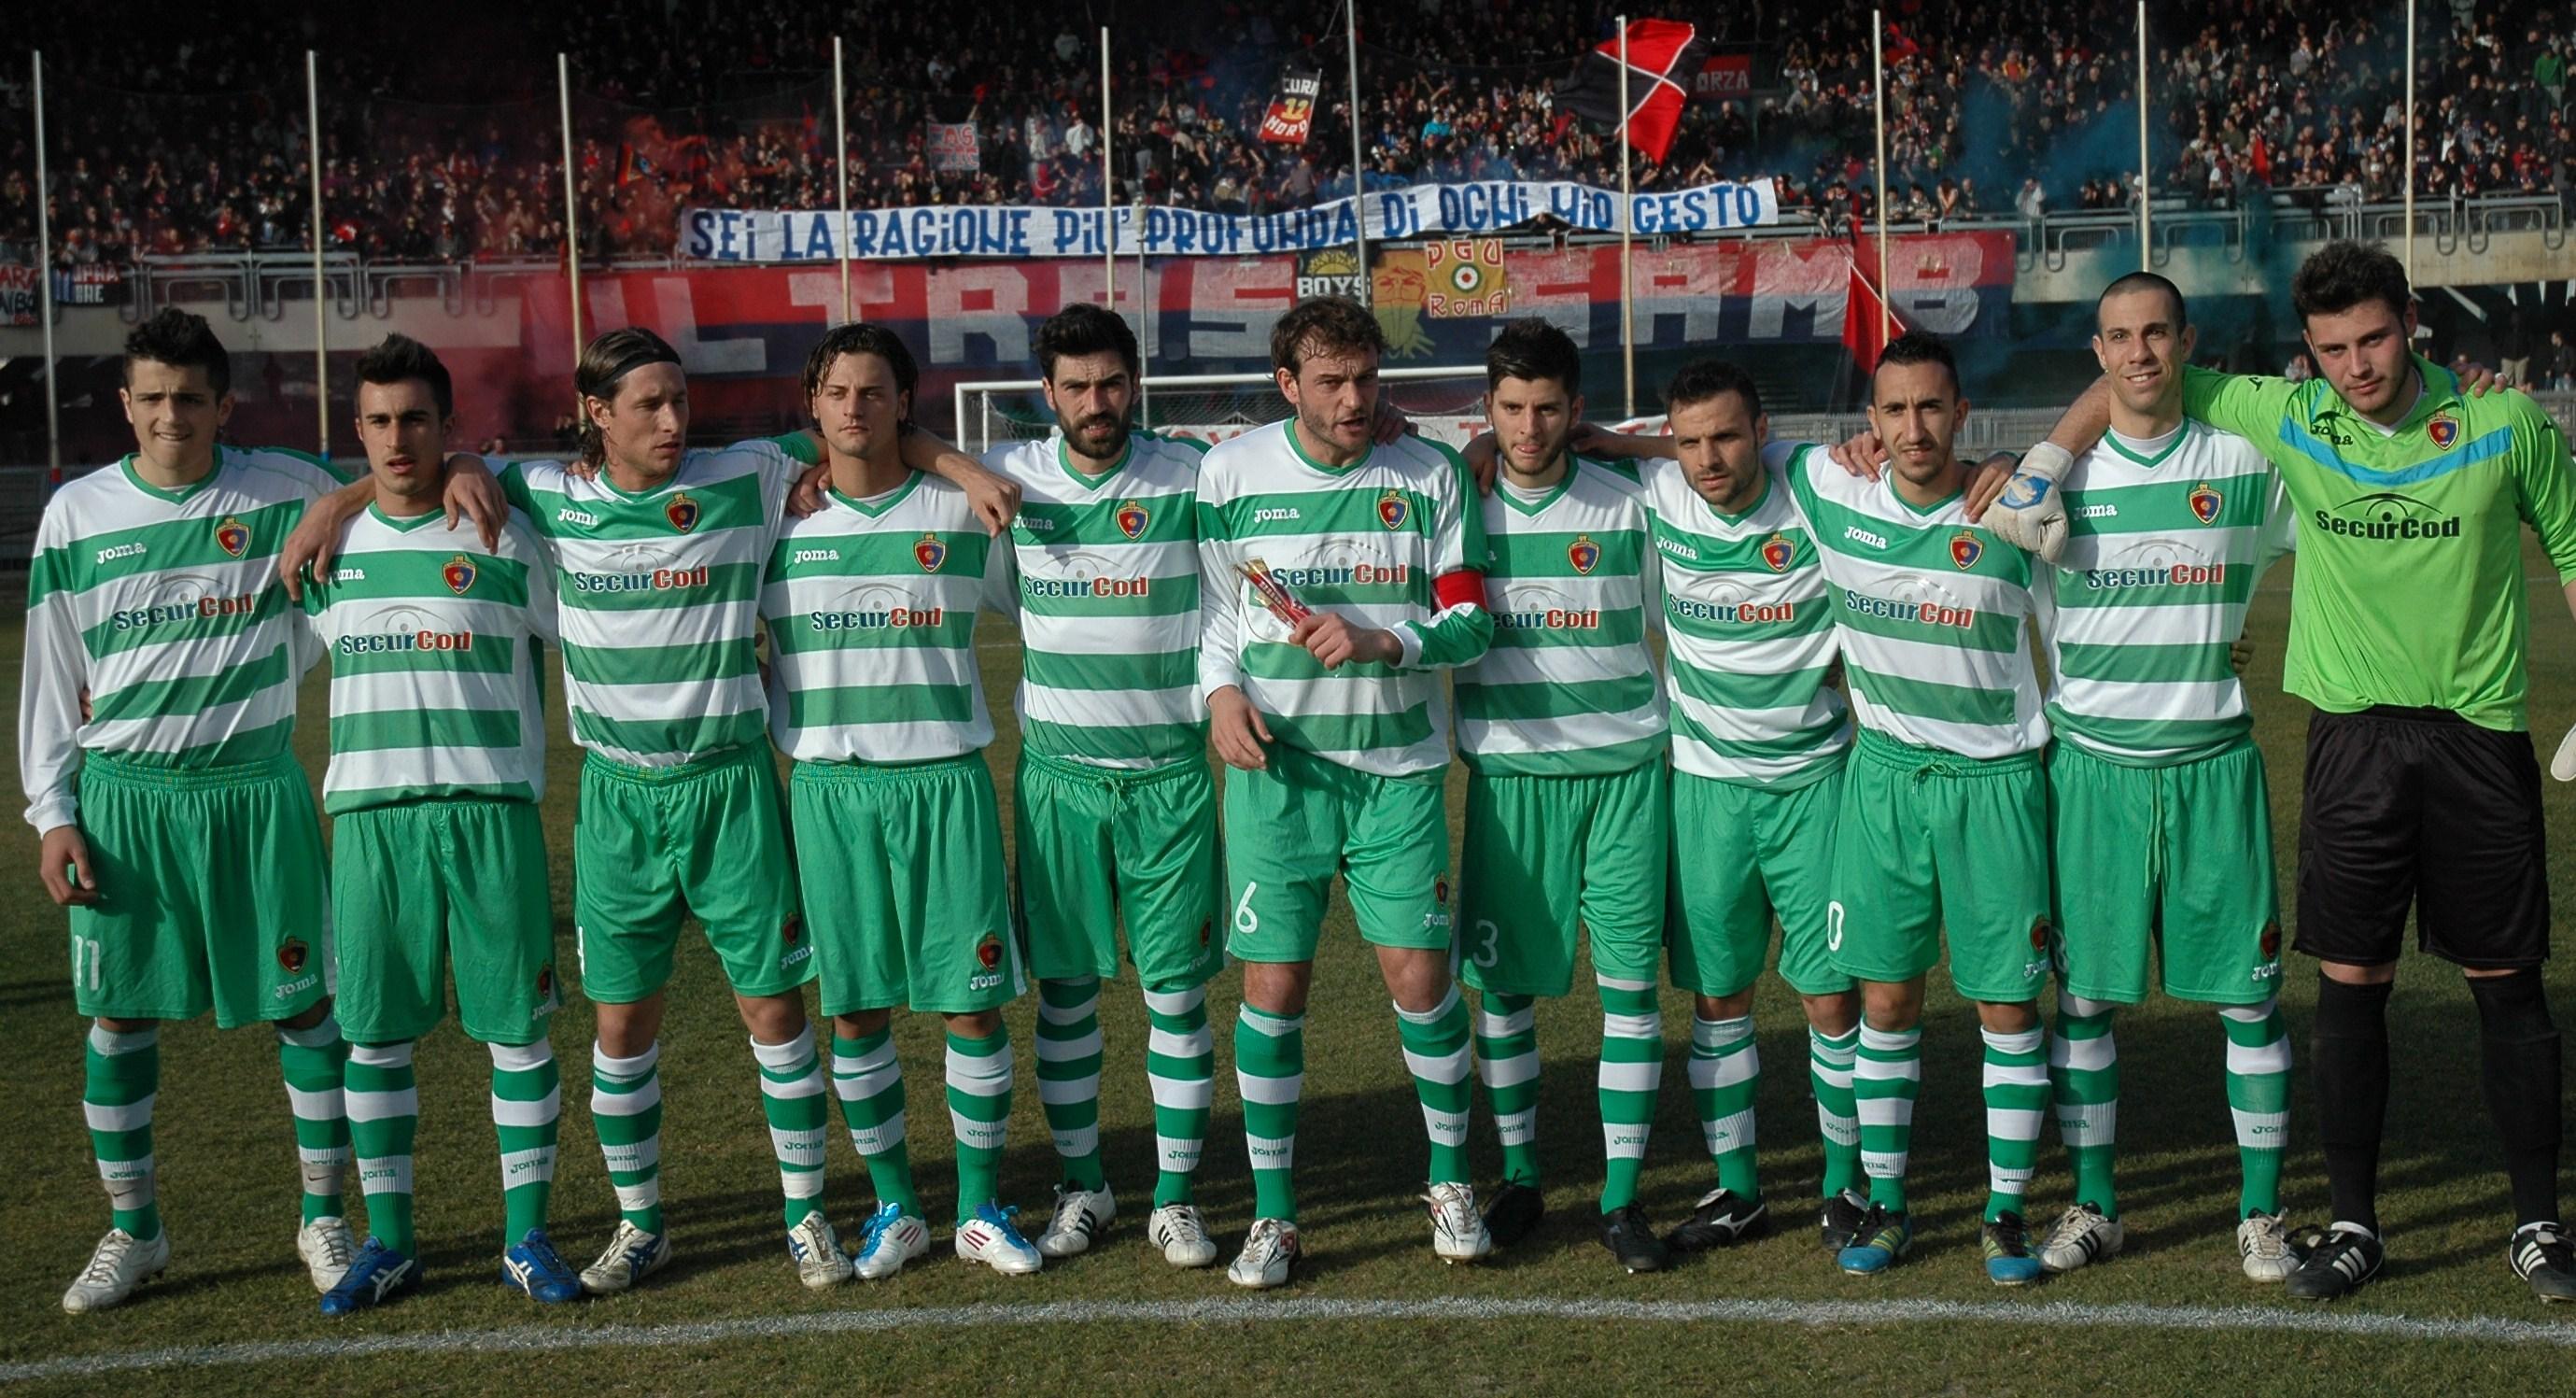 La Samb che ha battuto l'Ancona 1-0 Ph. Giammusso ©